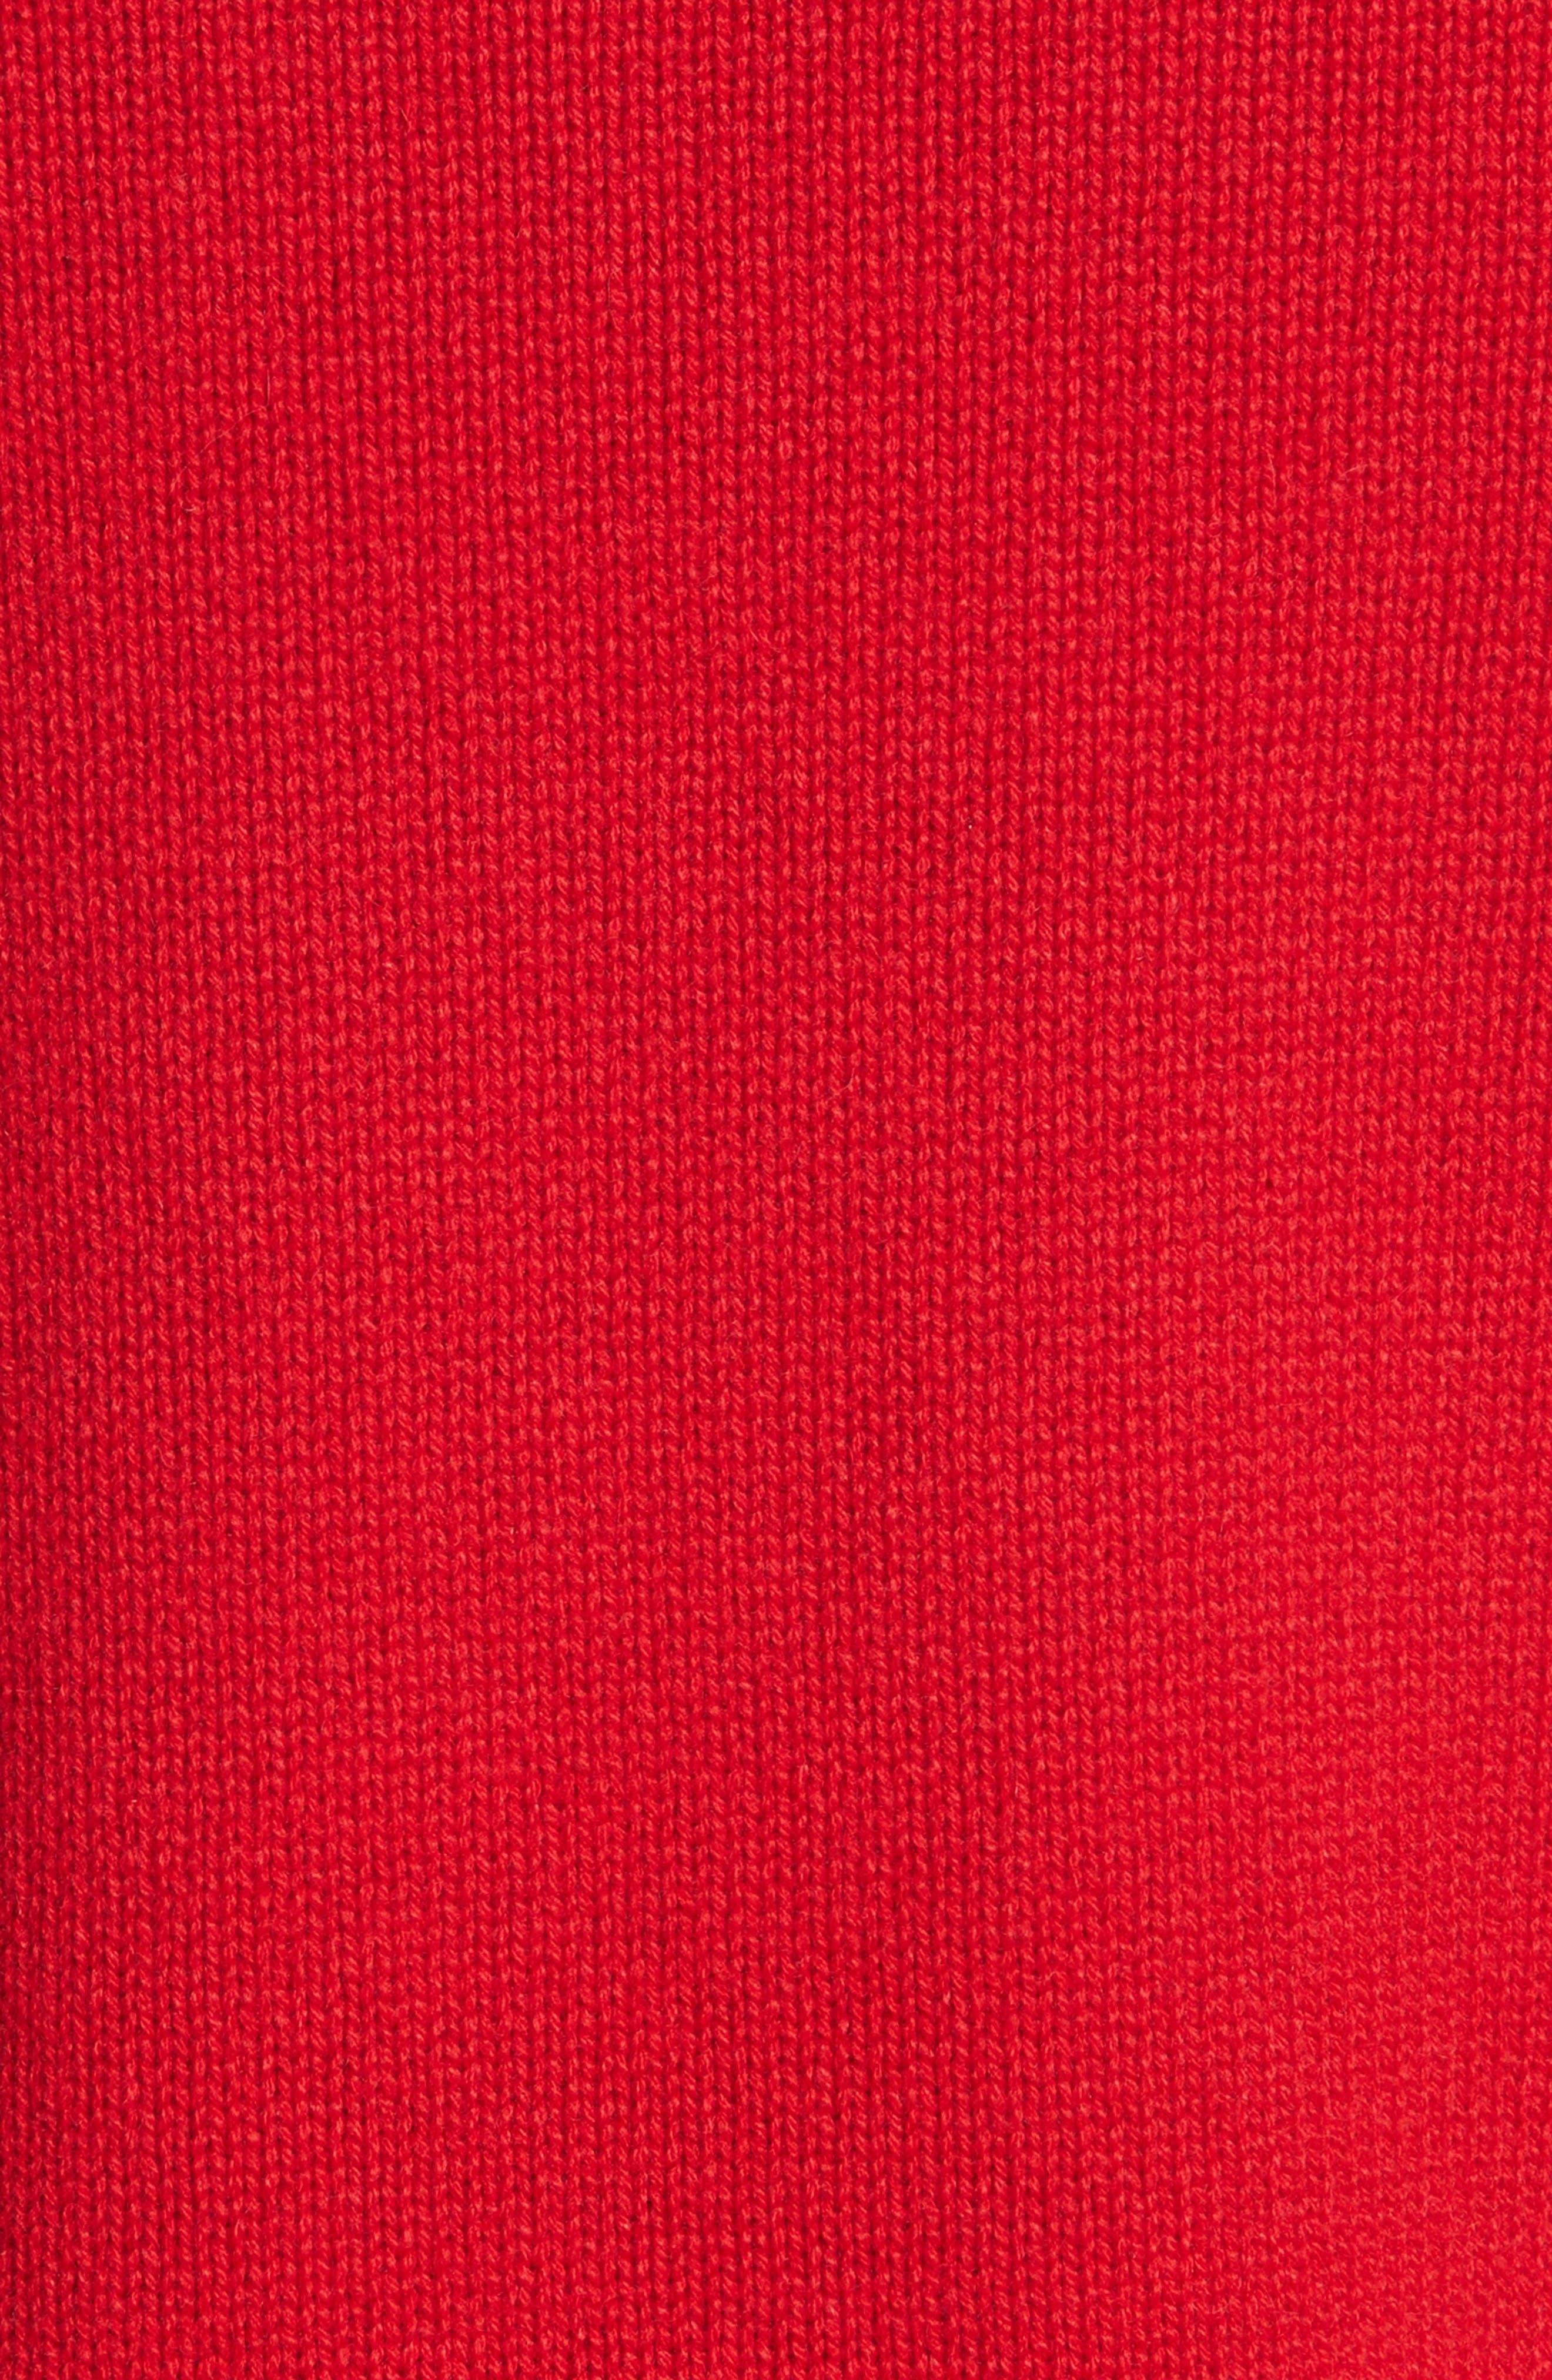 Rockstud Cashmere Sweater,                             Alternate thumbnail 5, color,                             610